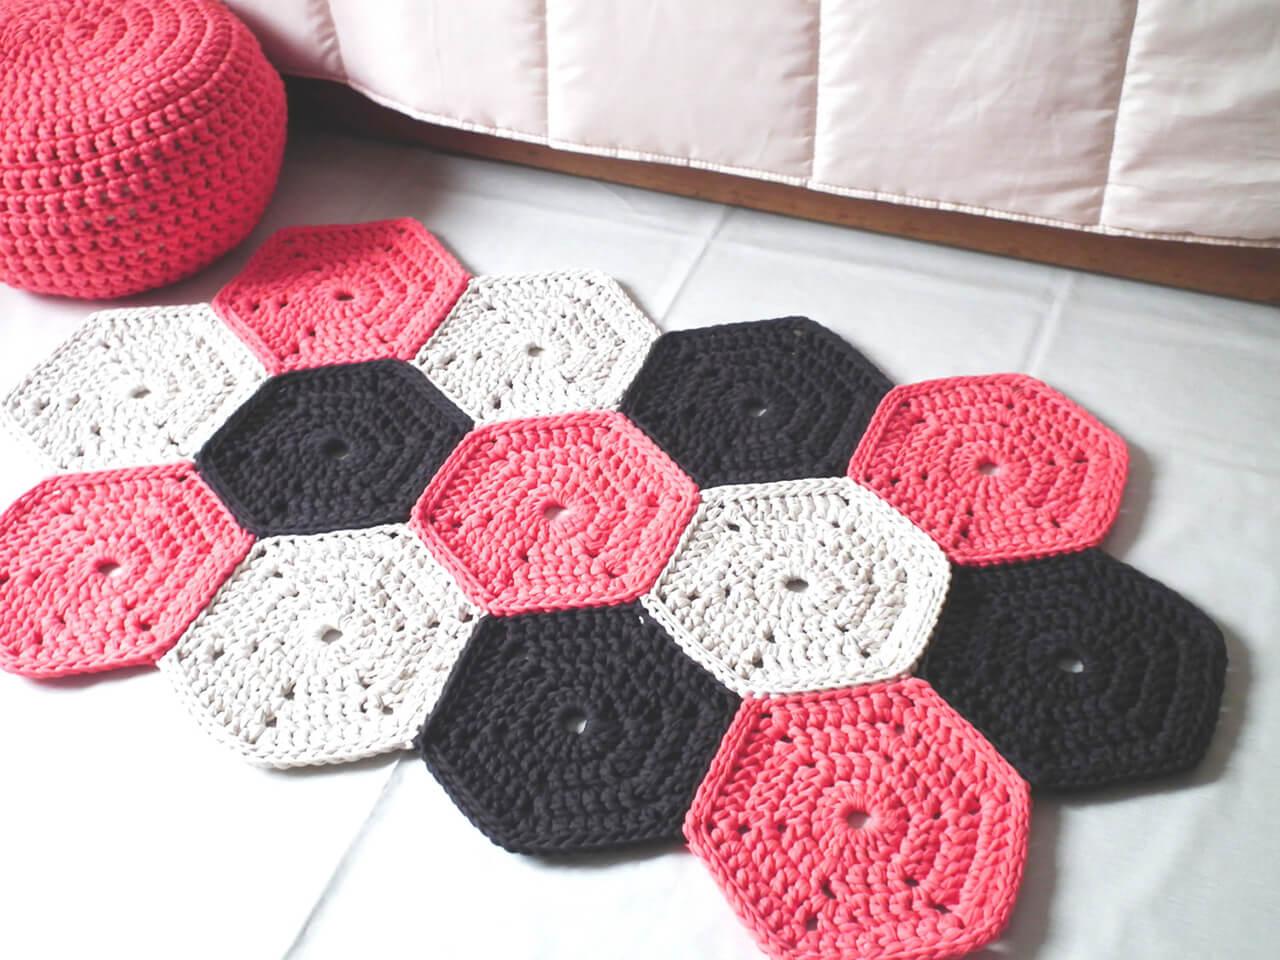 Crocheted Rug In Geometric Design